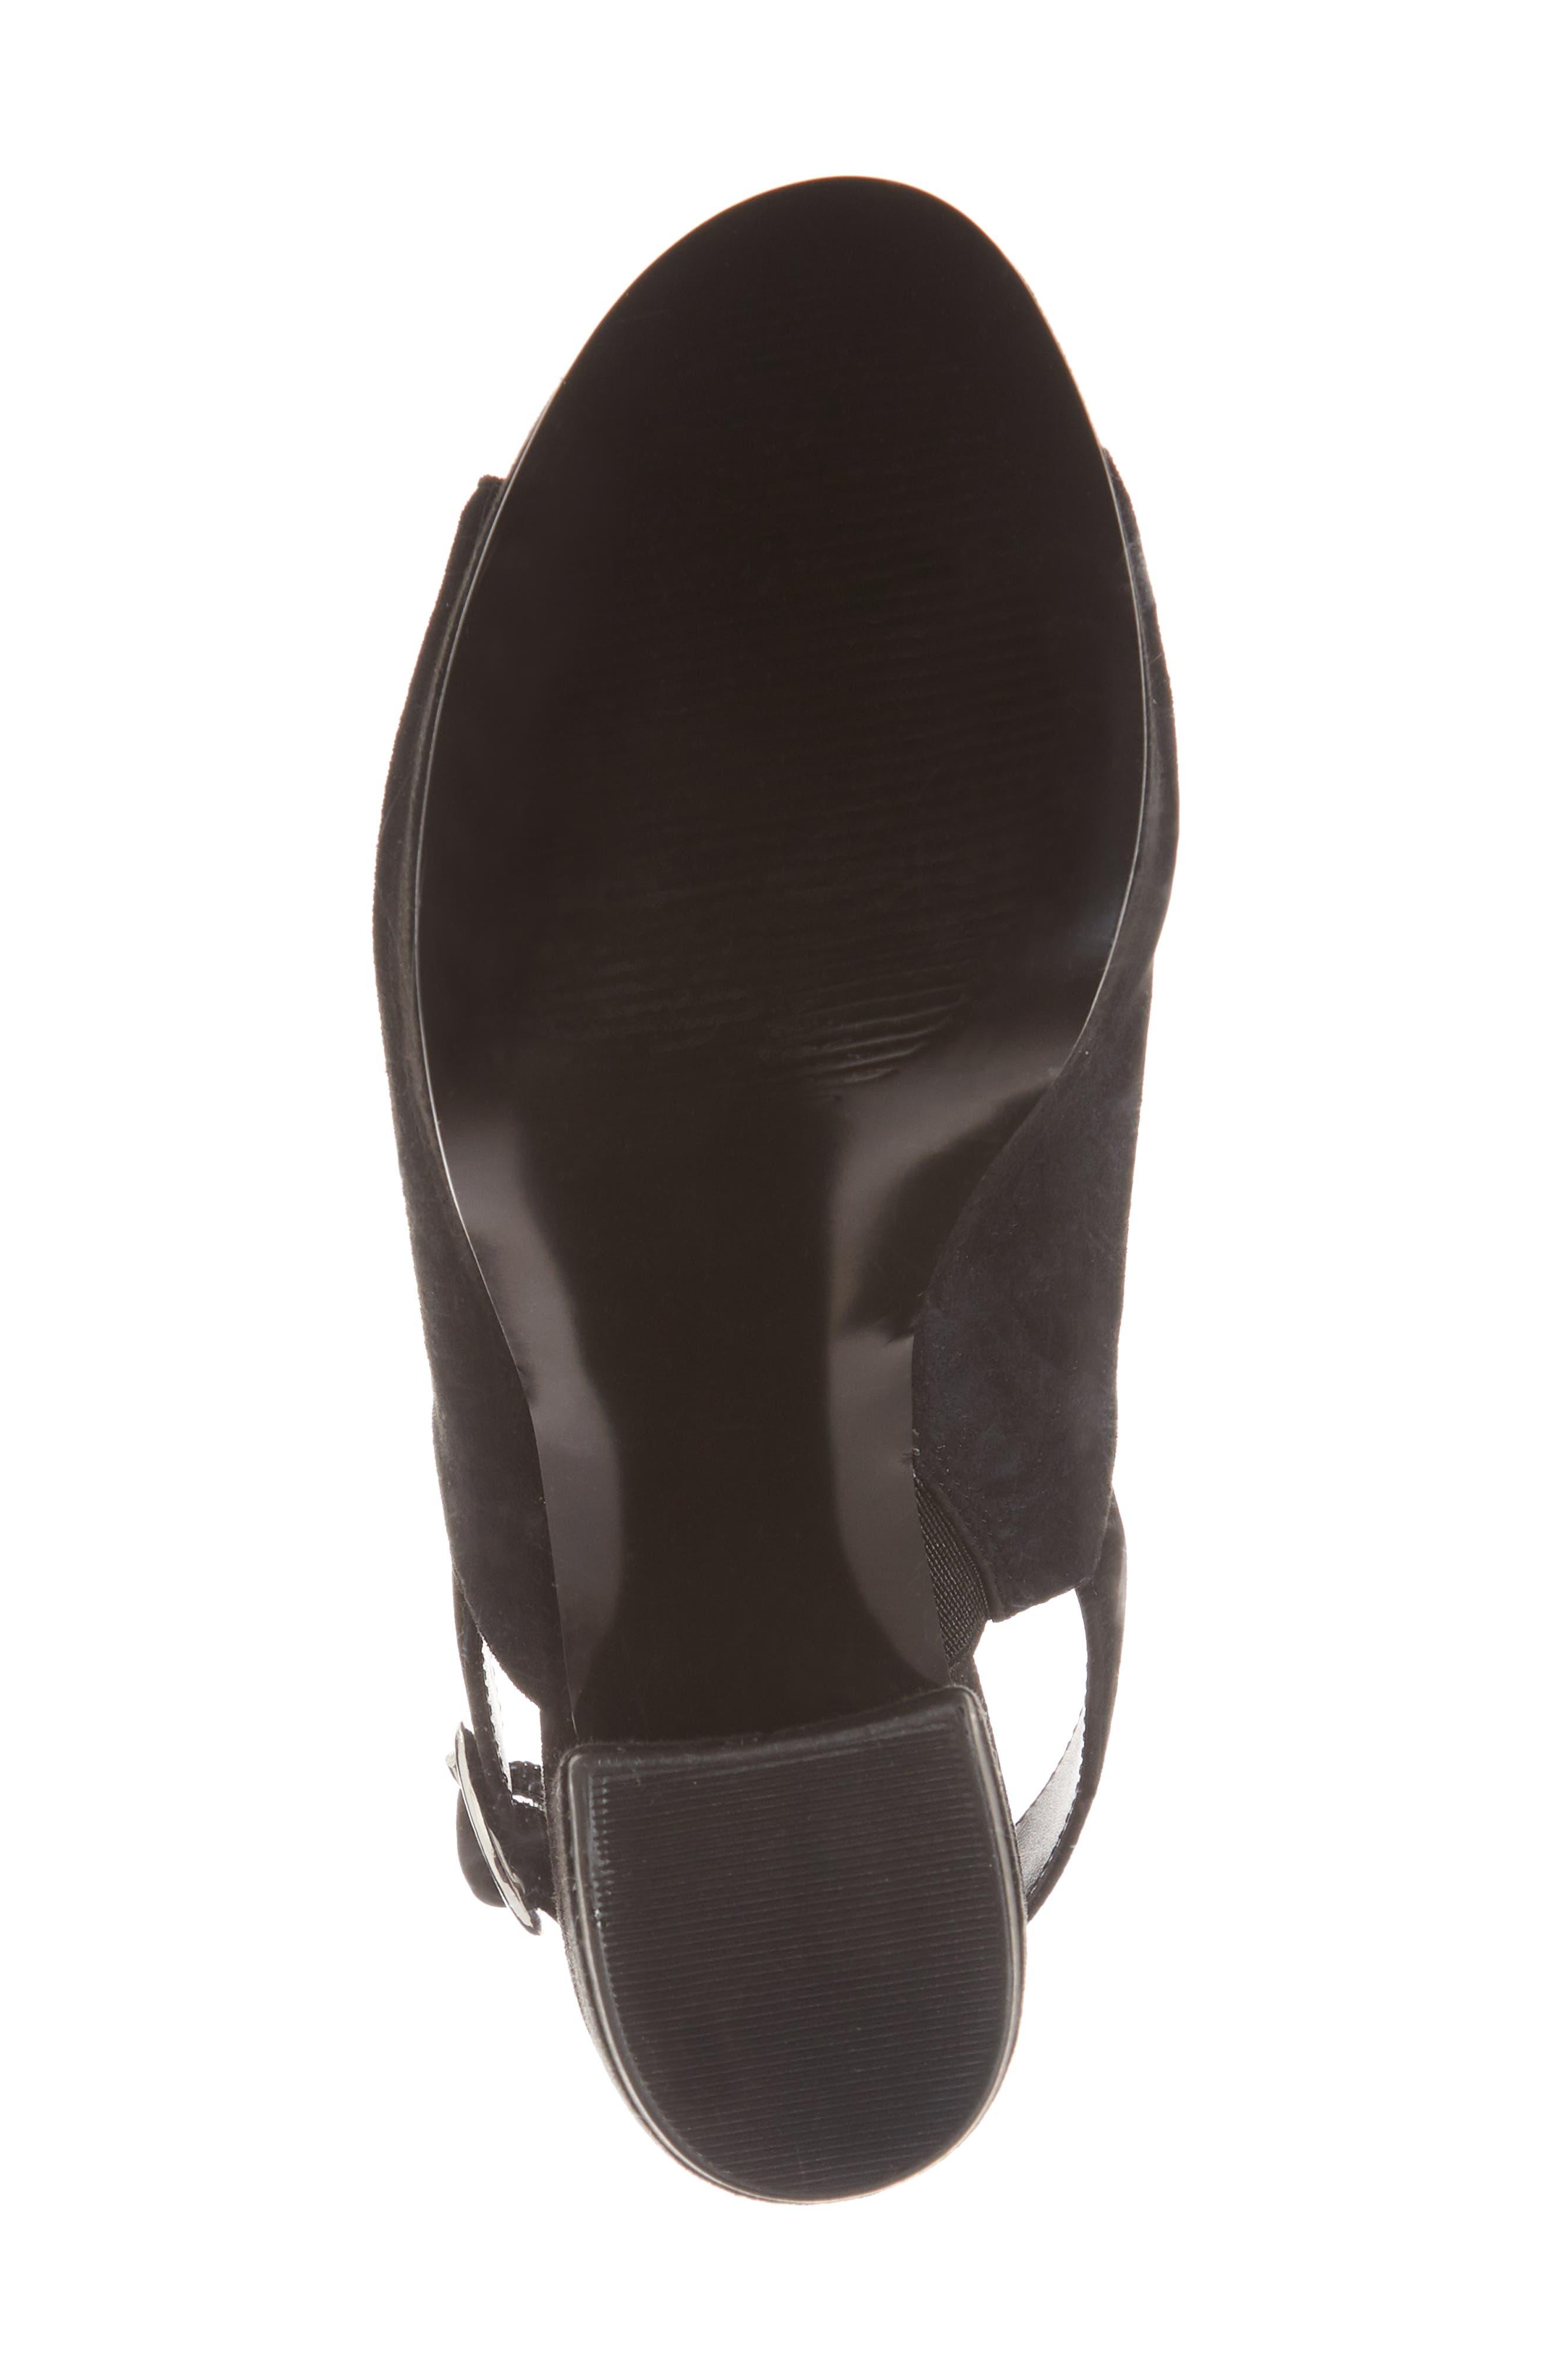 Carter Slingback Platform Sandal,                             Alternate thumbnail 6, color,                             006